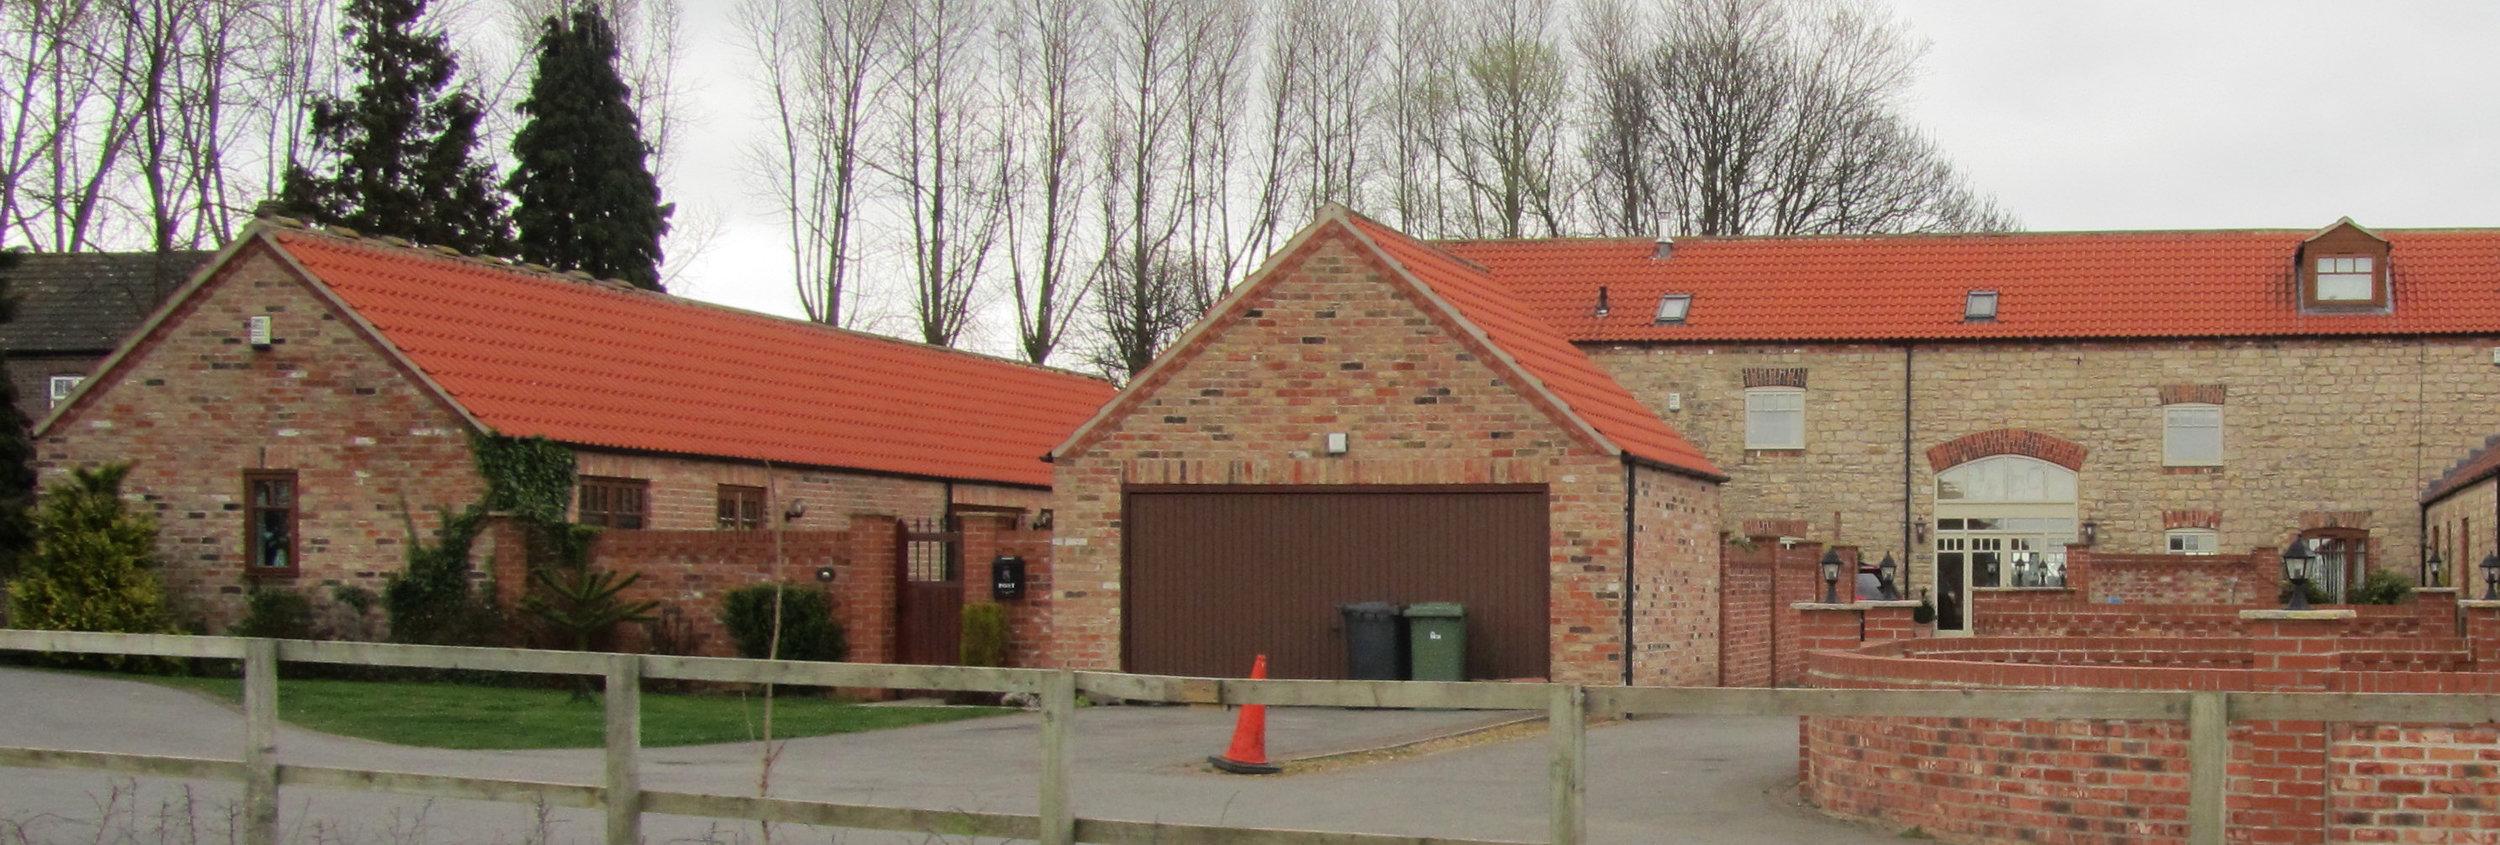 Brecks Farm 3 - Samuel Kendall Associates - Selby Architects